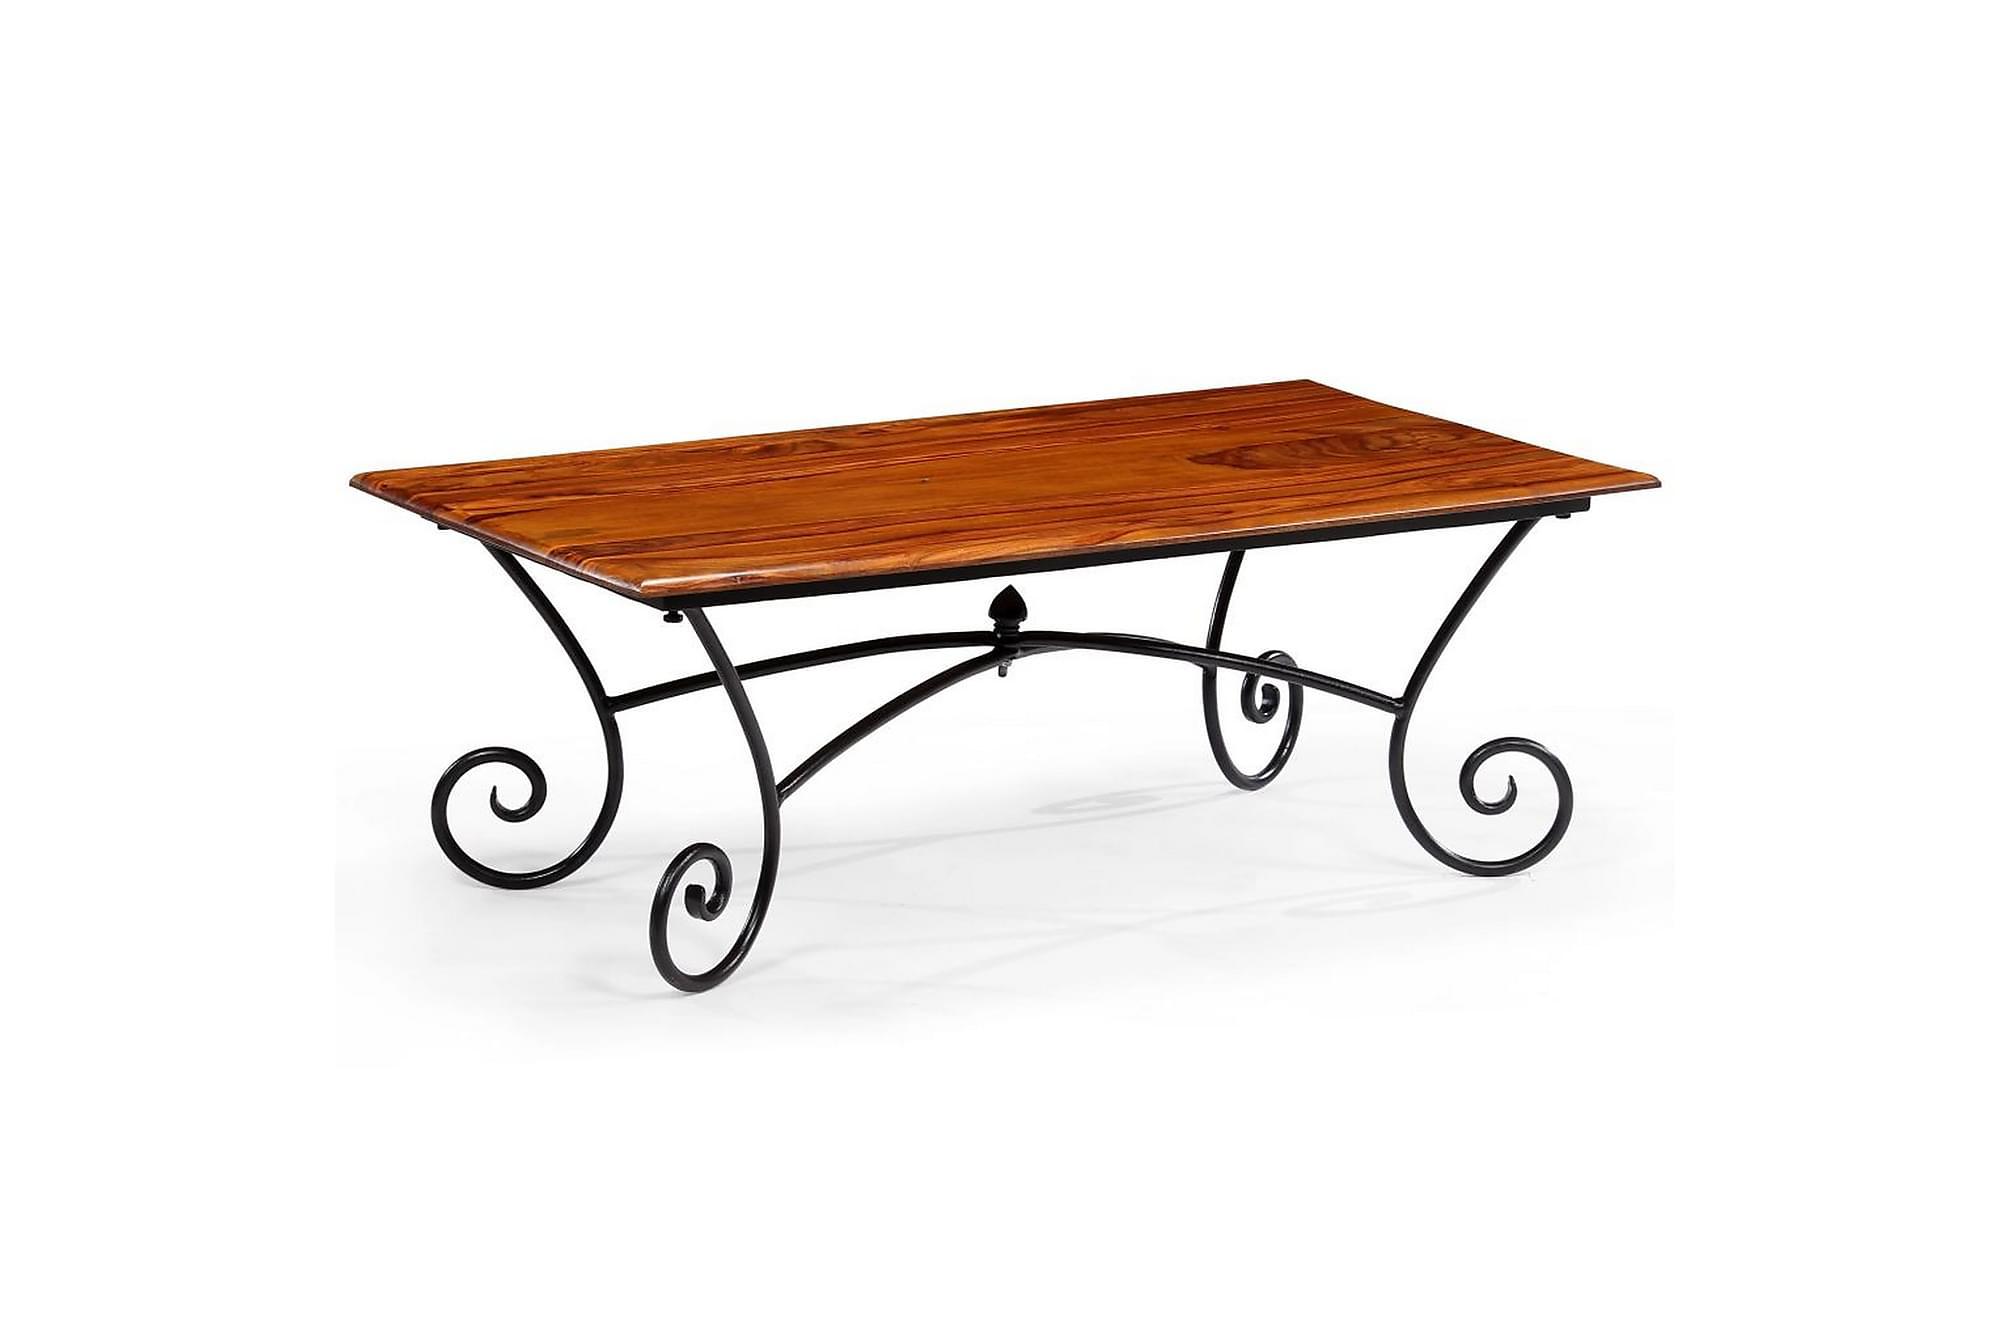 Soffbord med böjda ben massivt sheshamträ 110x60x39 cm